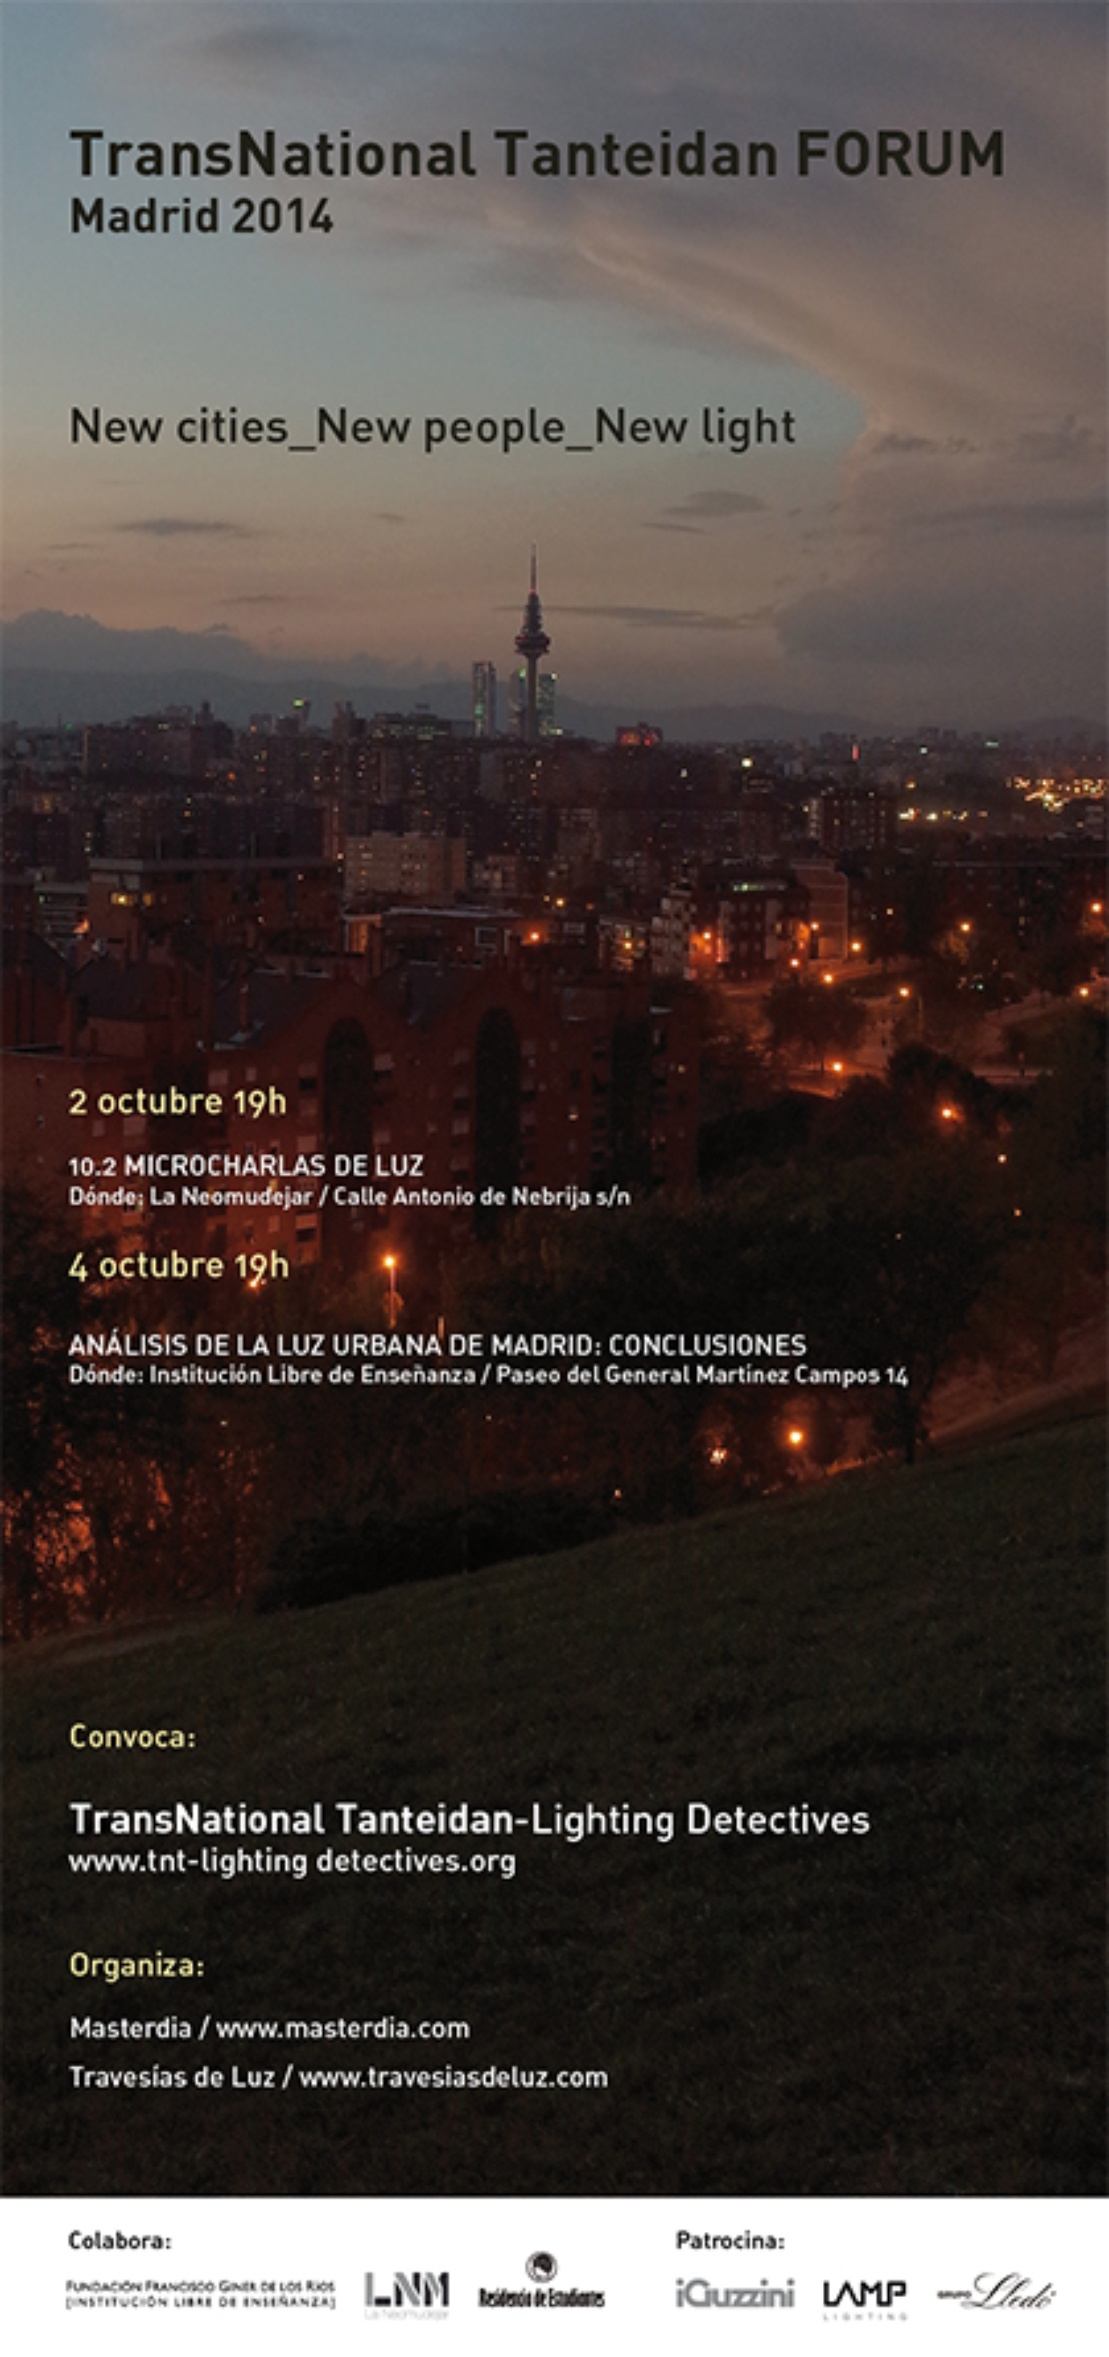 TNT Lighting Detectives 2014 Madrid